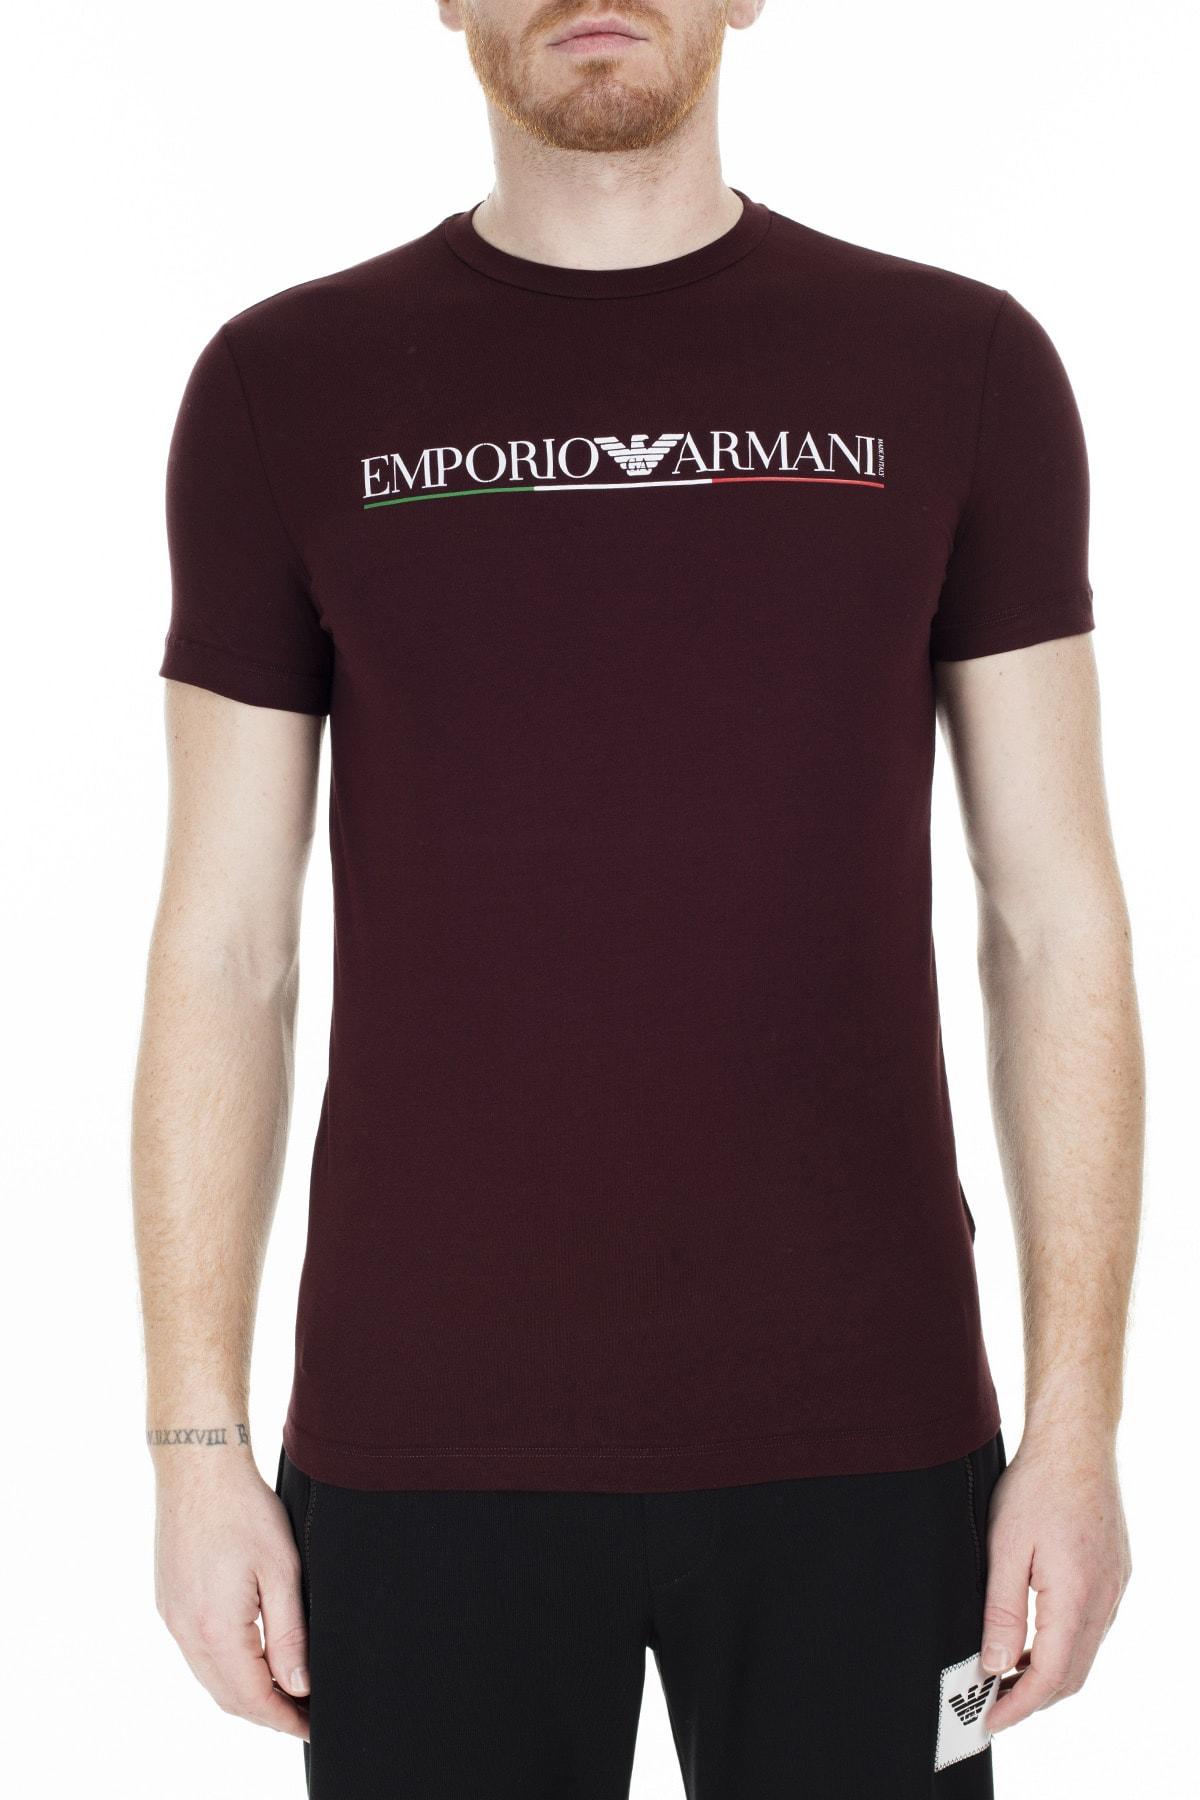 Emporio Armani T Shirt Erkek T Shirt S 6G1Tb8 1J11Z 0348 S 6G1TB8 1J11Z 0348